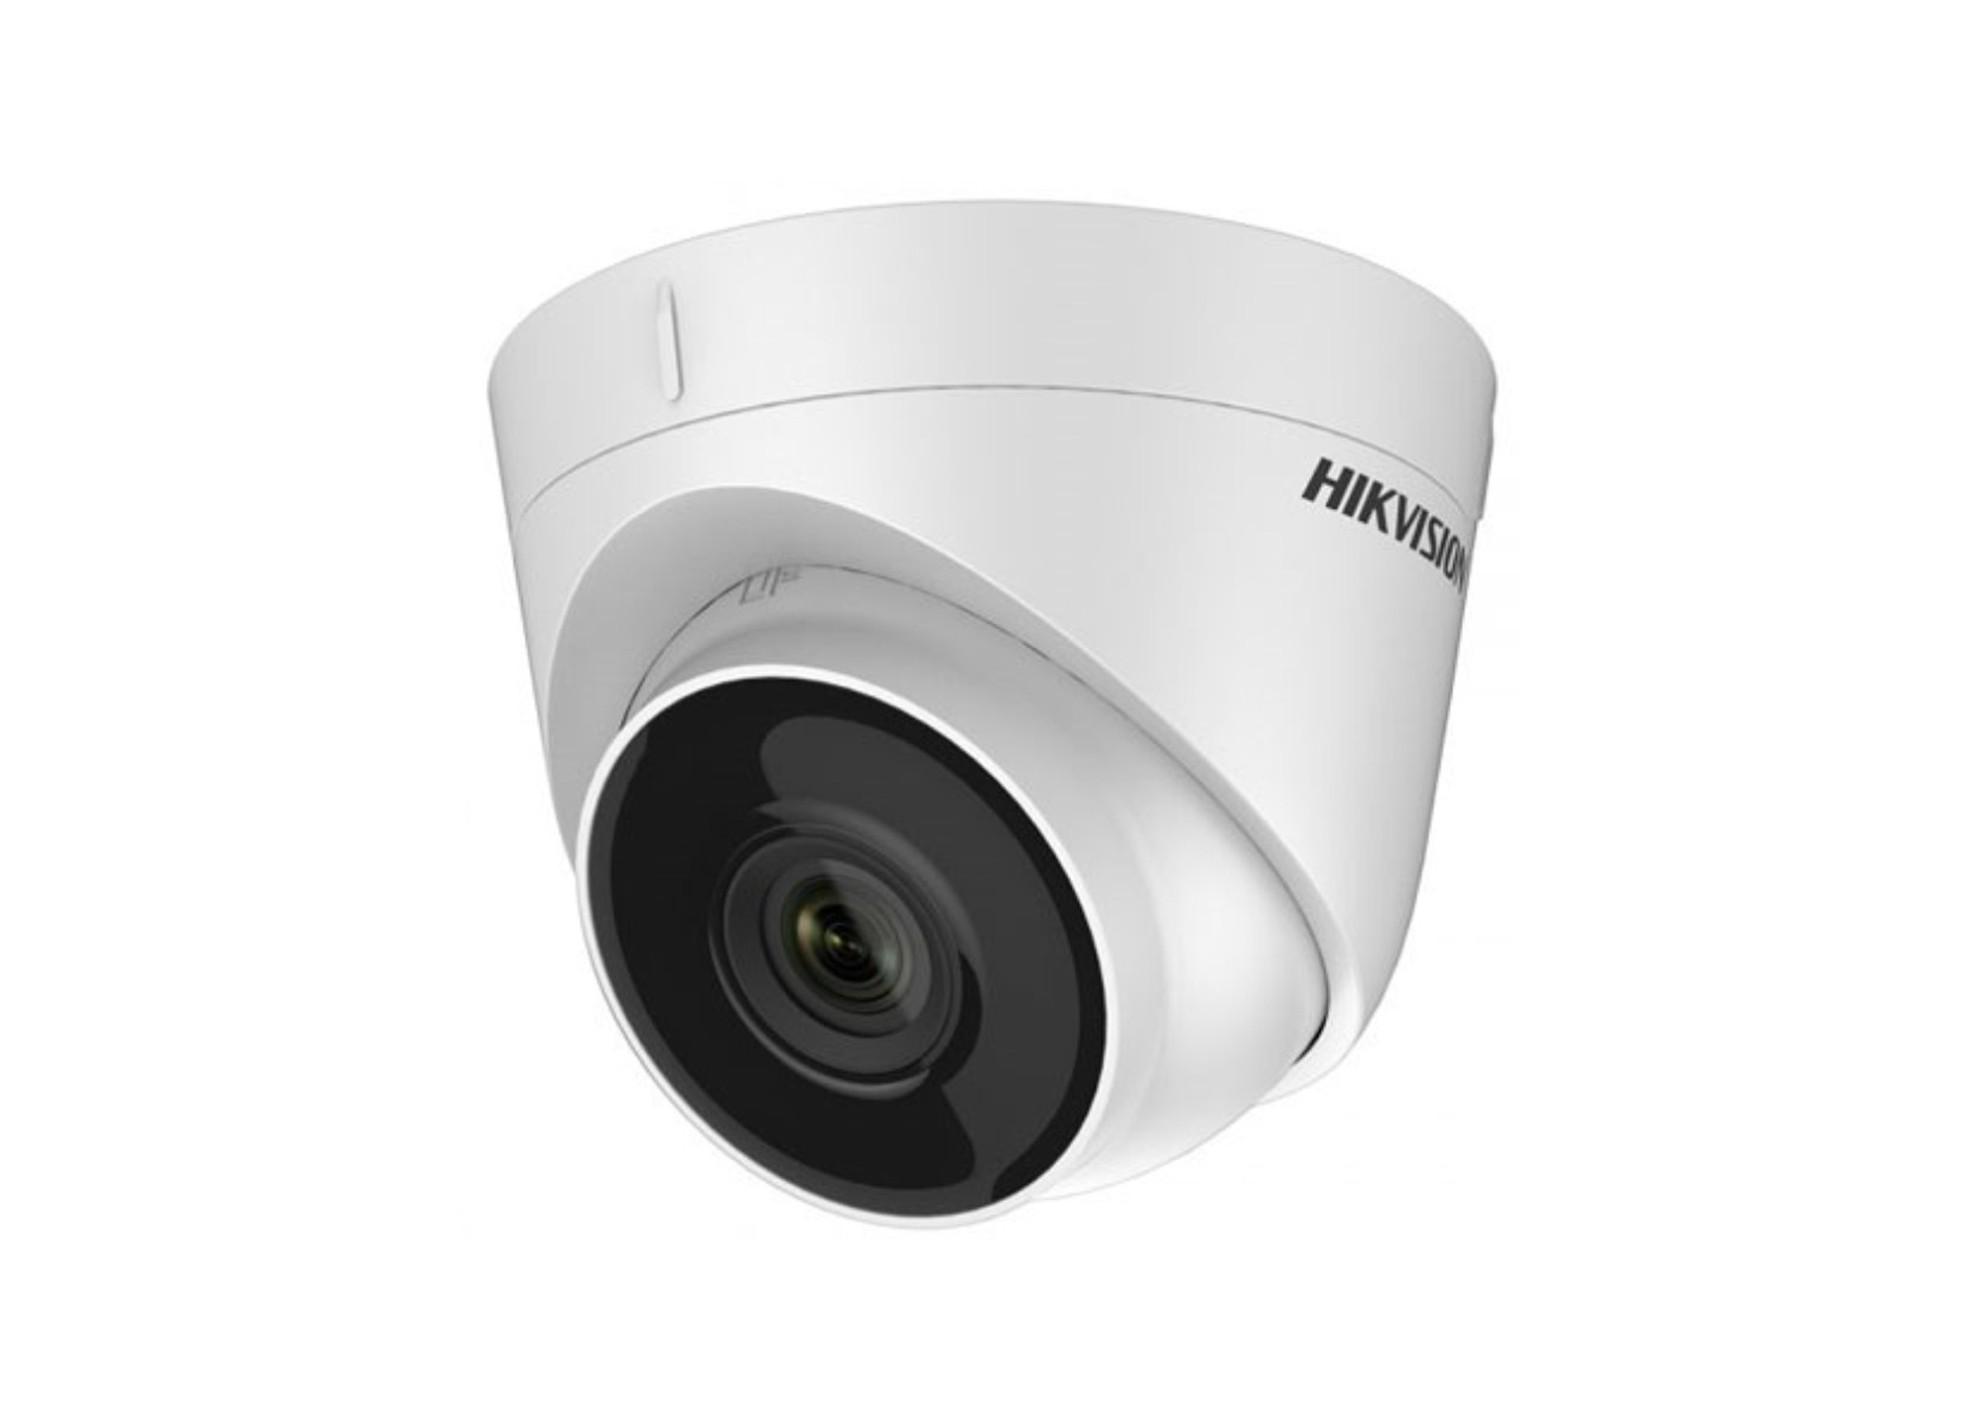 Kamera DS-2CD1343G0-I (2.8mm)  rč.013B